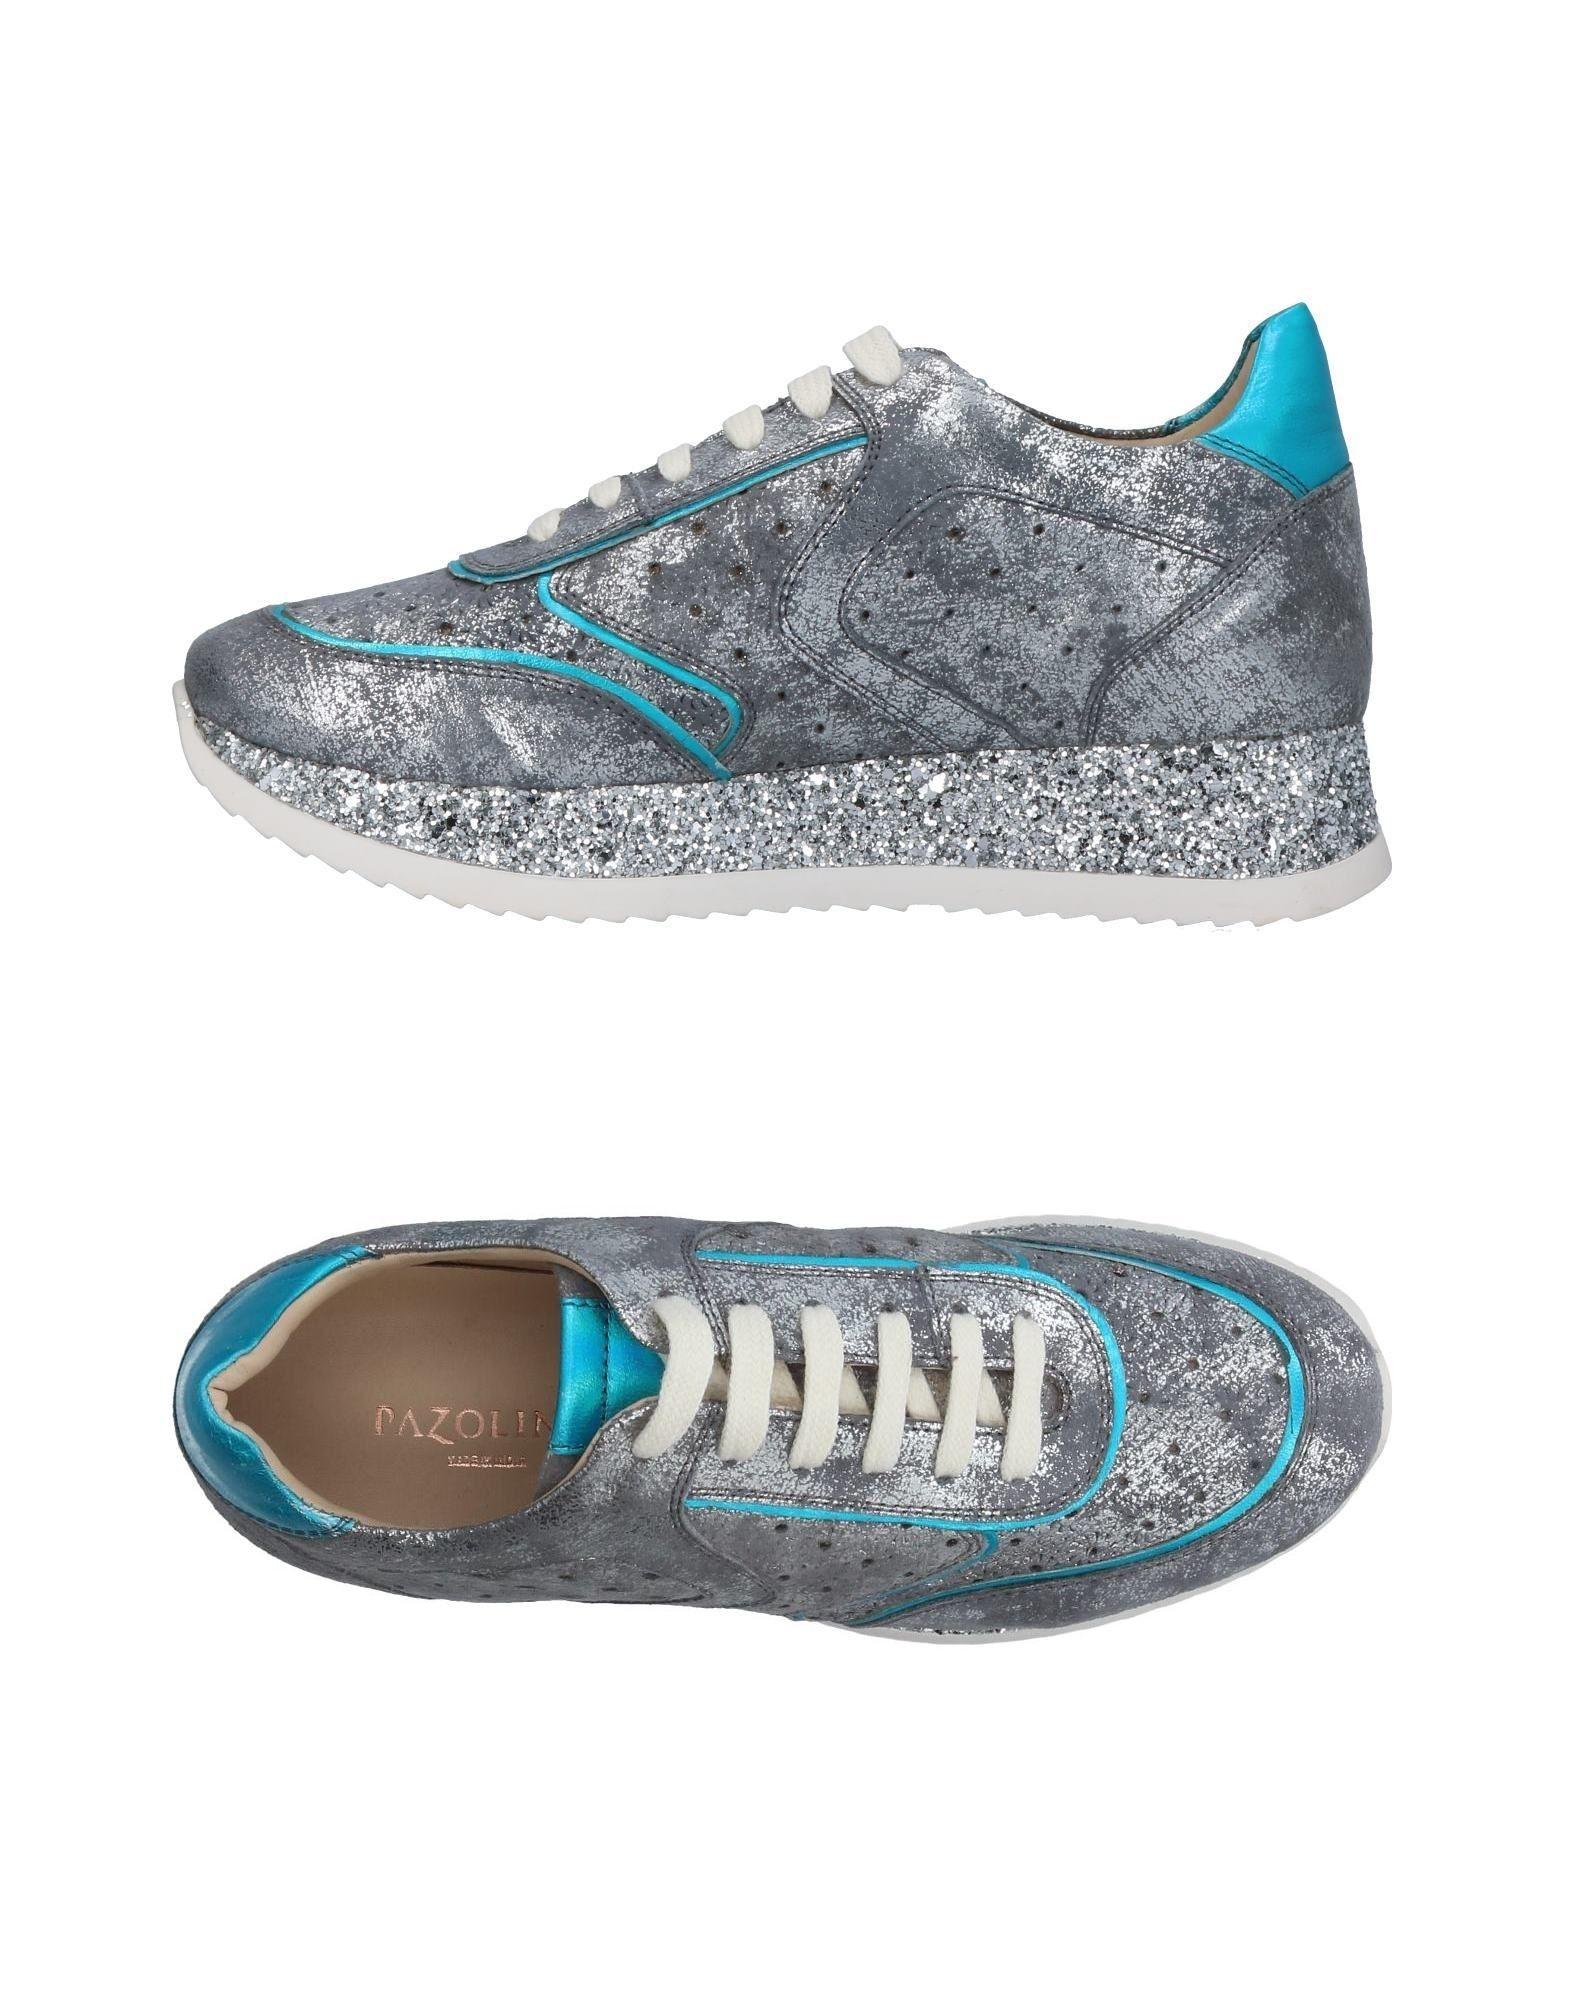 Carlo Pazolini Sneakers Damen  11407550ME Gute Qualität beliebte Schuhe